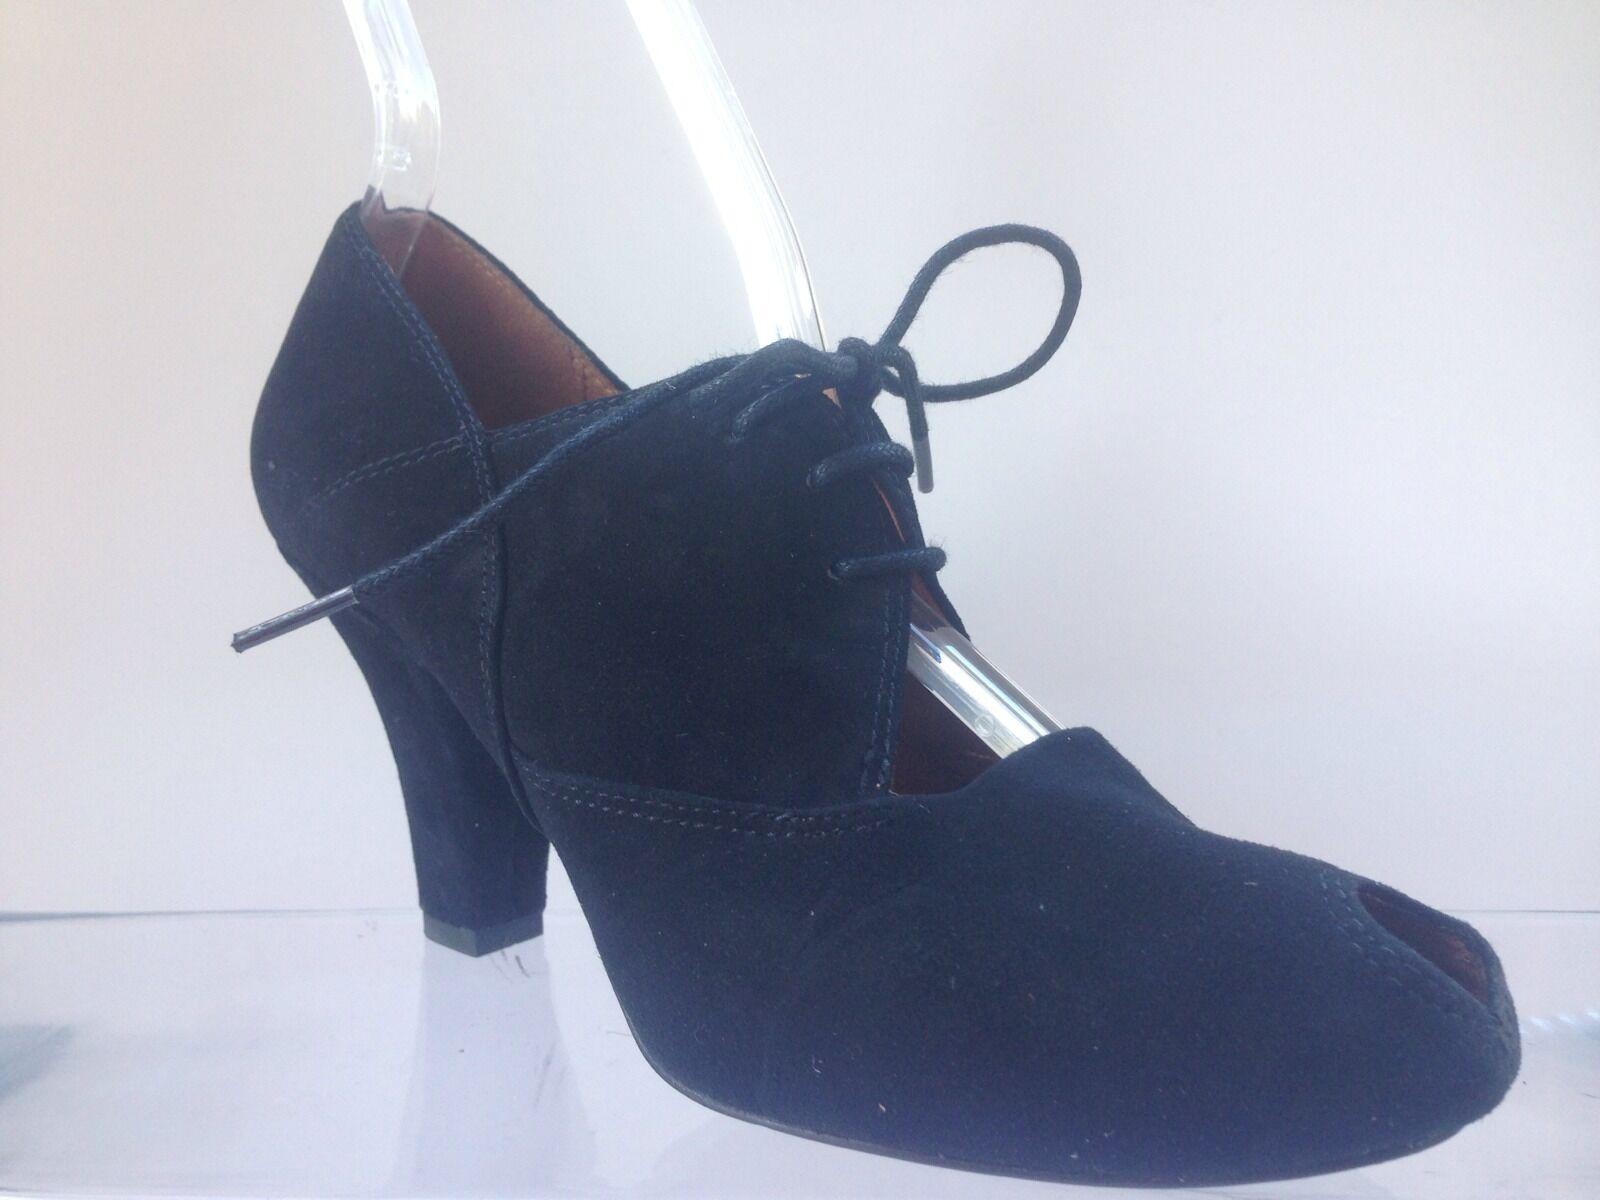 Gentle Souls Black Suede Peep Pumps  Ankle Booties Size 5 1 2. GREAT